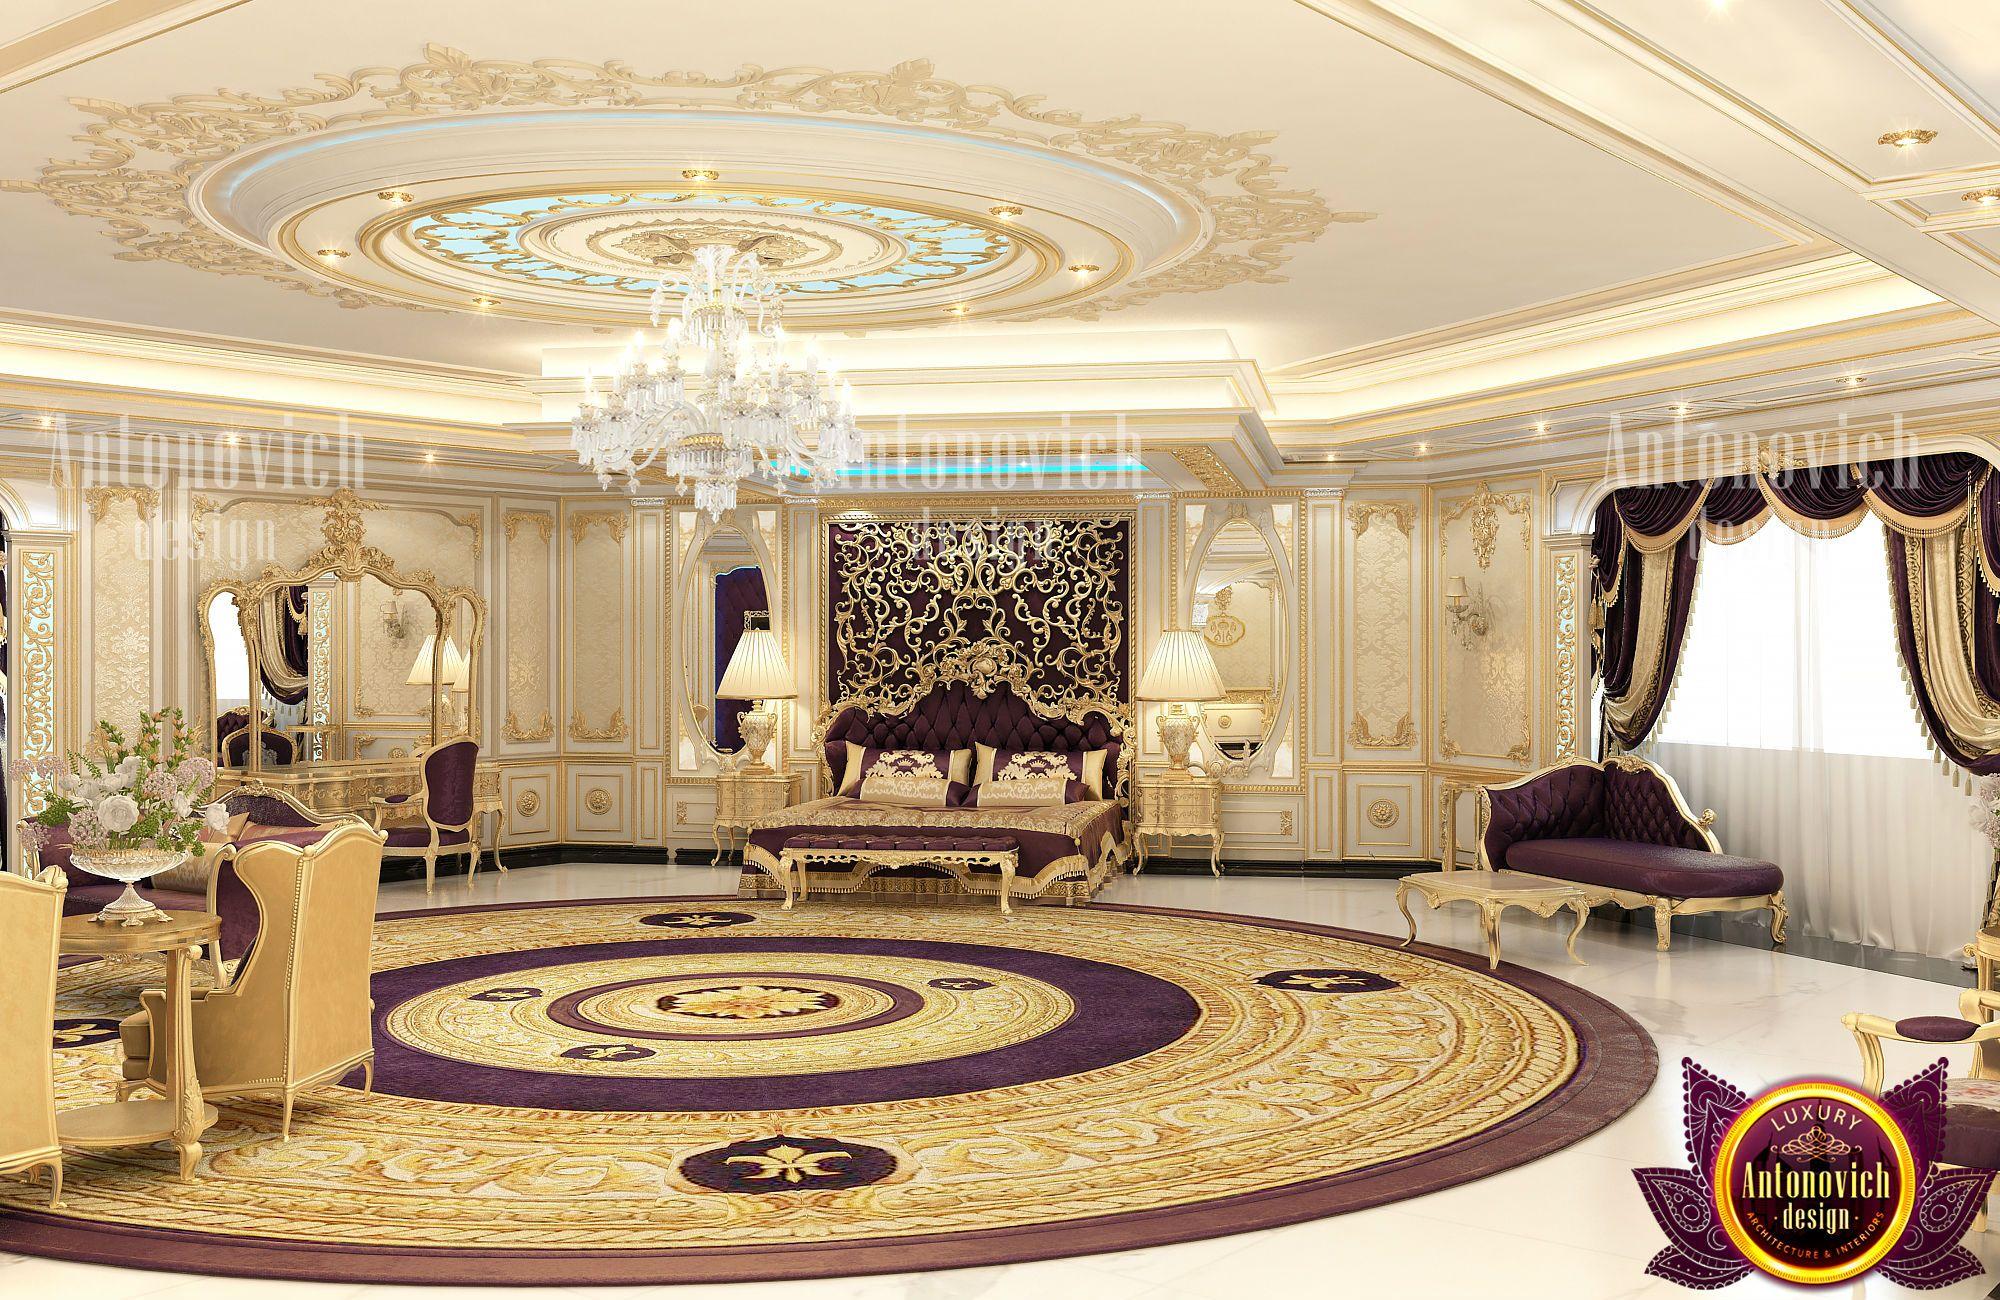 Bedroom Fit Out Ideas Desain Ide Kamar Tidur Ide Dekorasi Kamar